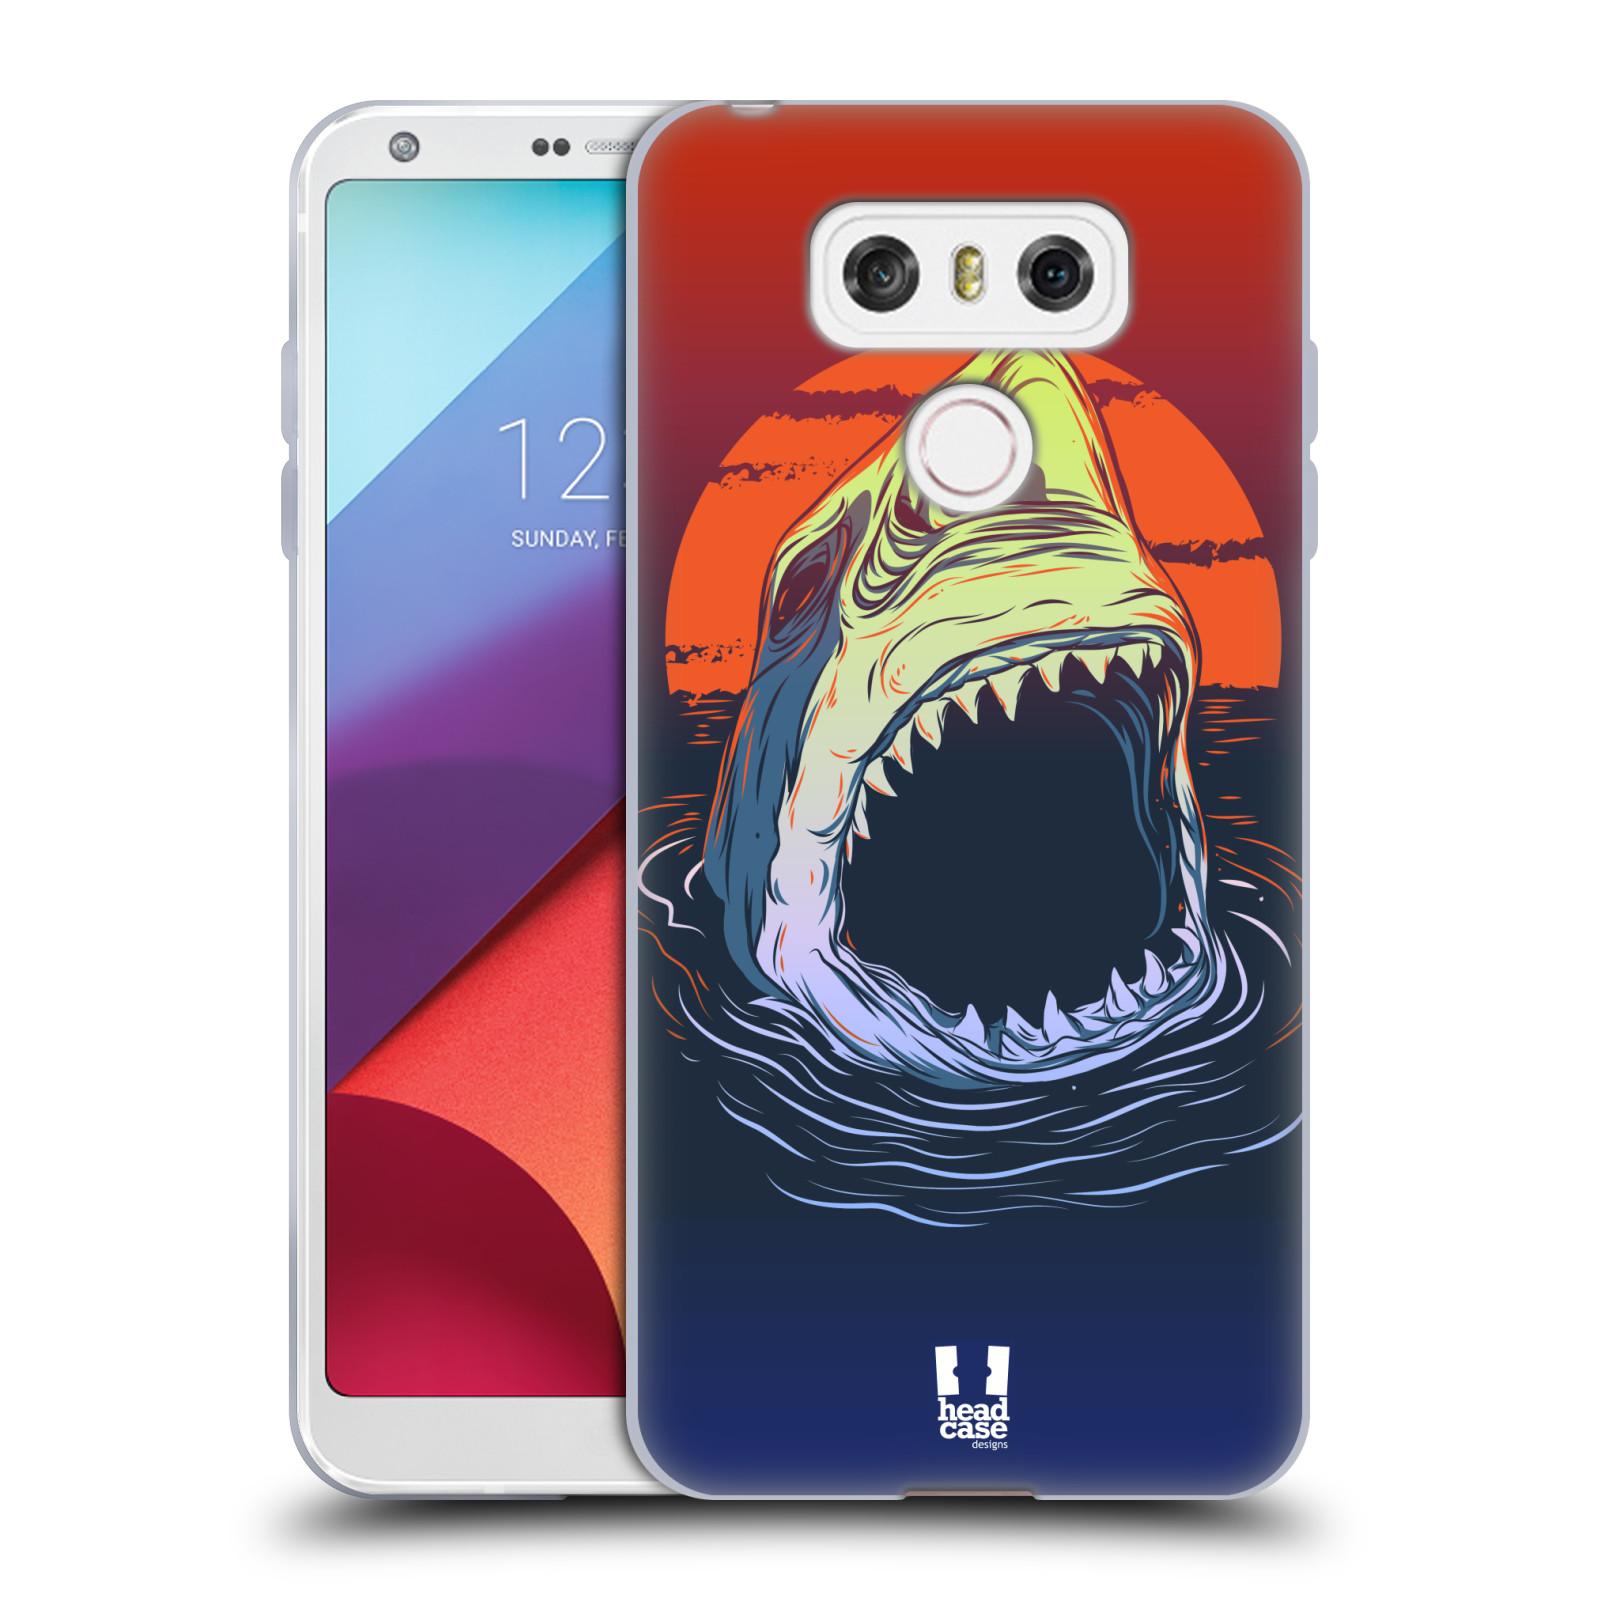 Silikonové pouzdro na mobil LG G6 - Head Case HLADOVÝ ŽRALOK (Silikonový kryt či obal na mobilní telefon LG G6 H870 / LG G6 Dual SIM H870DS)